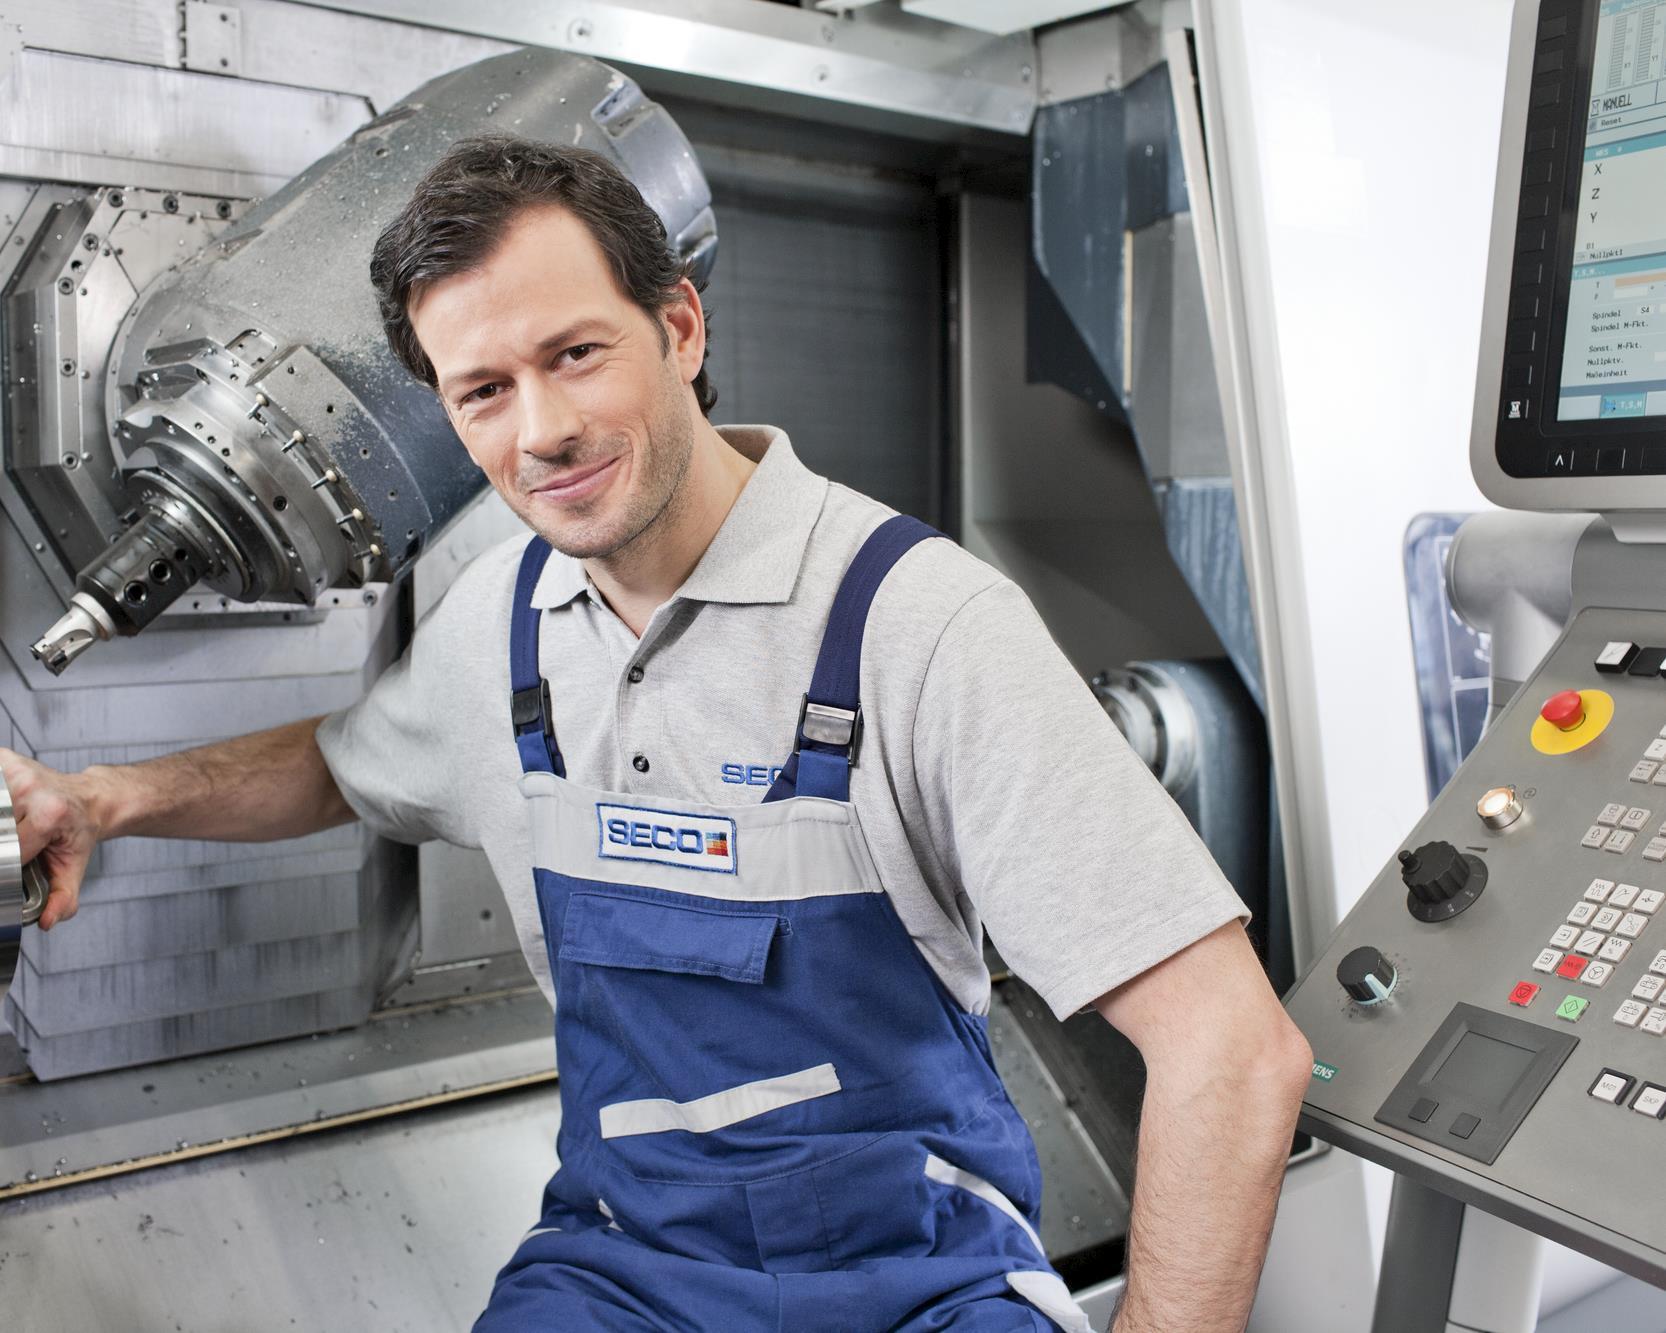 HQ_IMG_Technician_On_Machine_2.tif